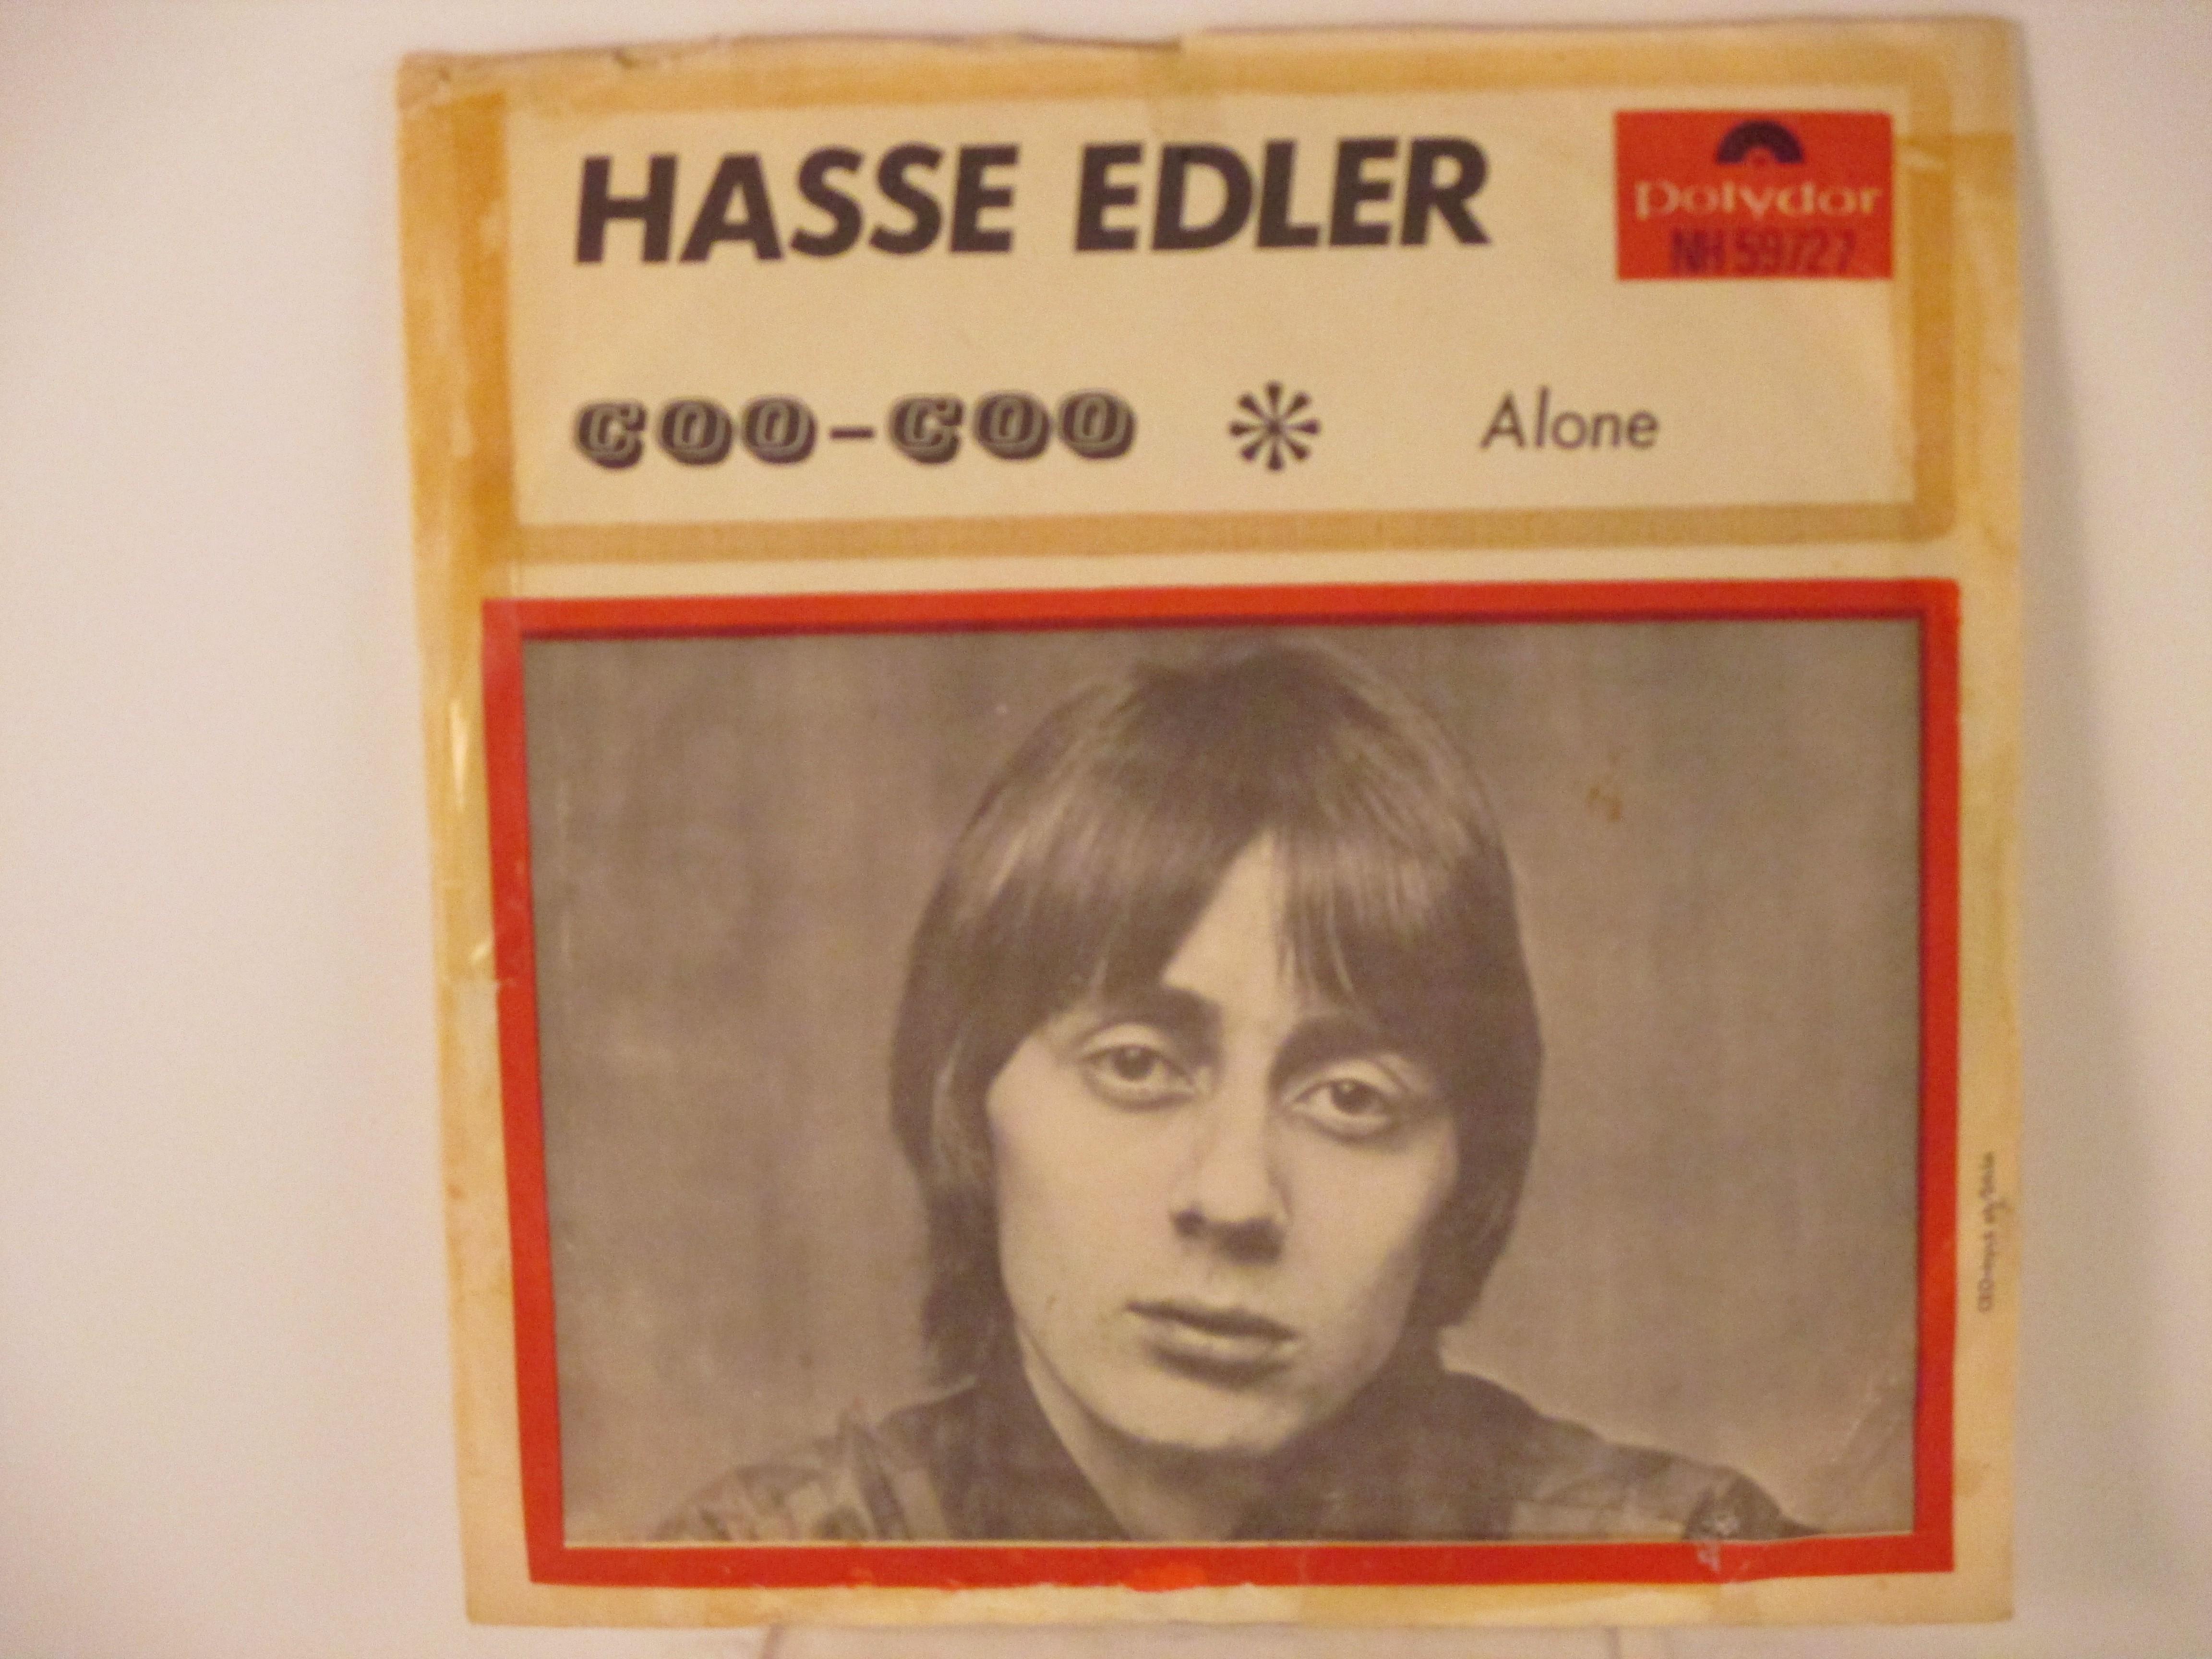 HASSE EDLER (of WE 4) : Alone / Goo-goo